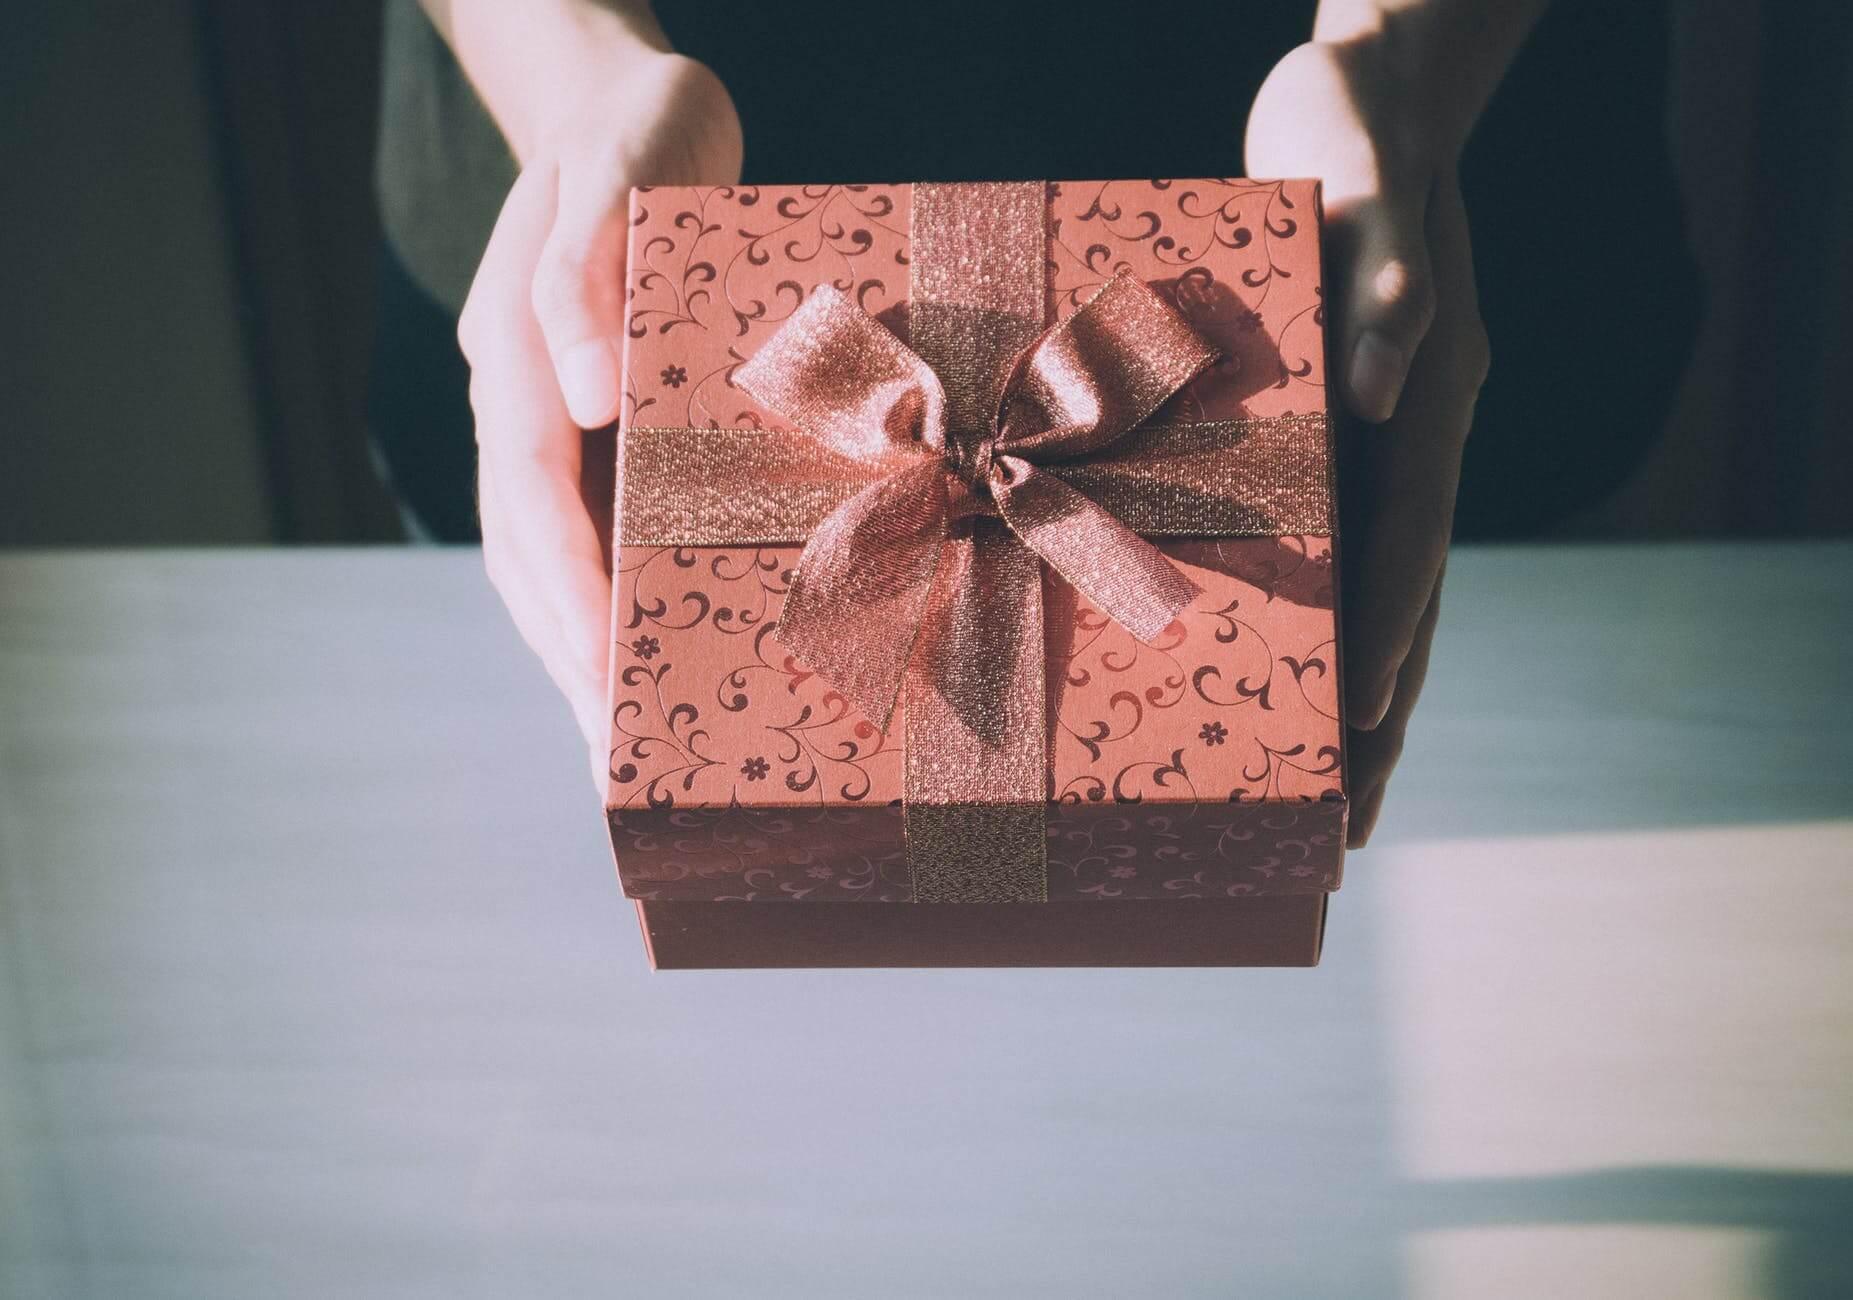 Arkadaşa doğum günü hediyesi, birthday gift for friend